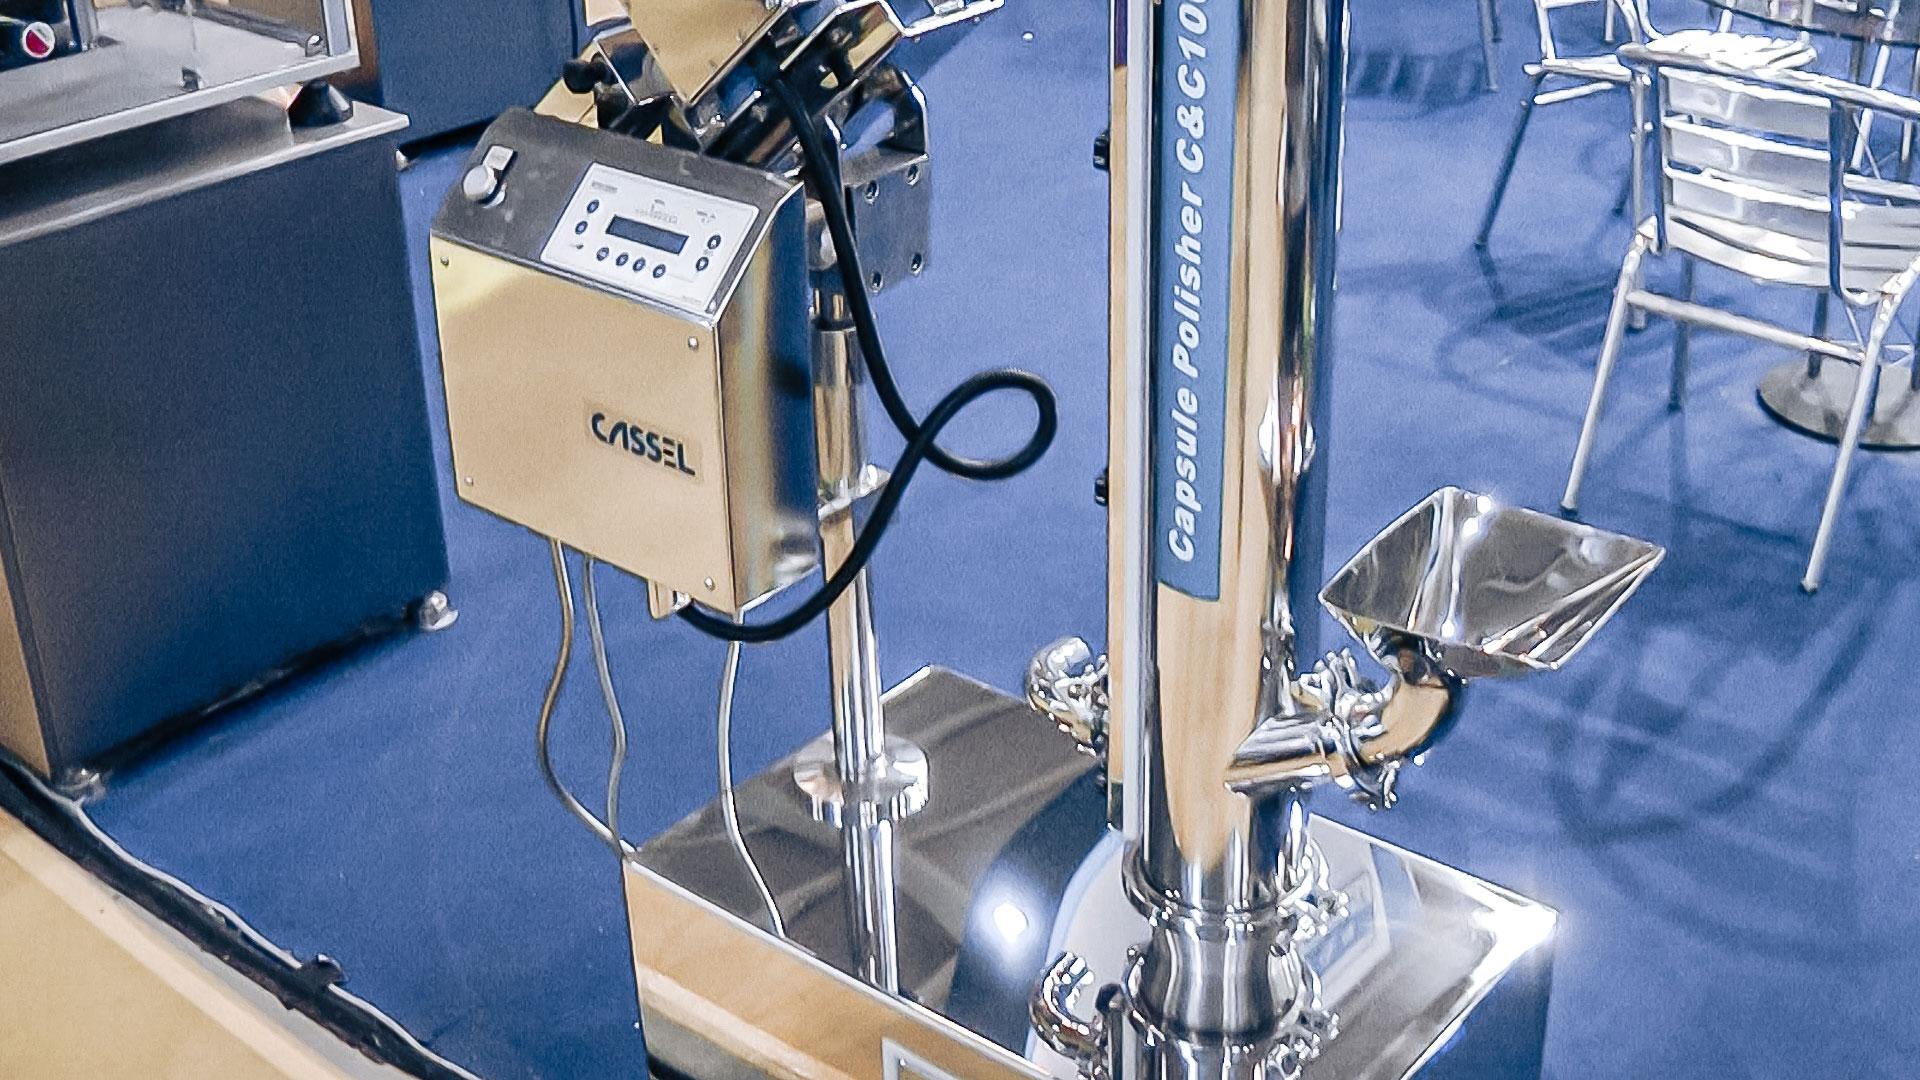 Automatic equipment for polishing gelatin capsules pharmaceutical production